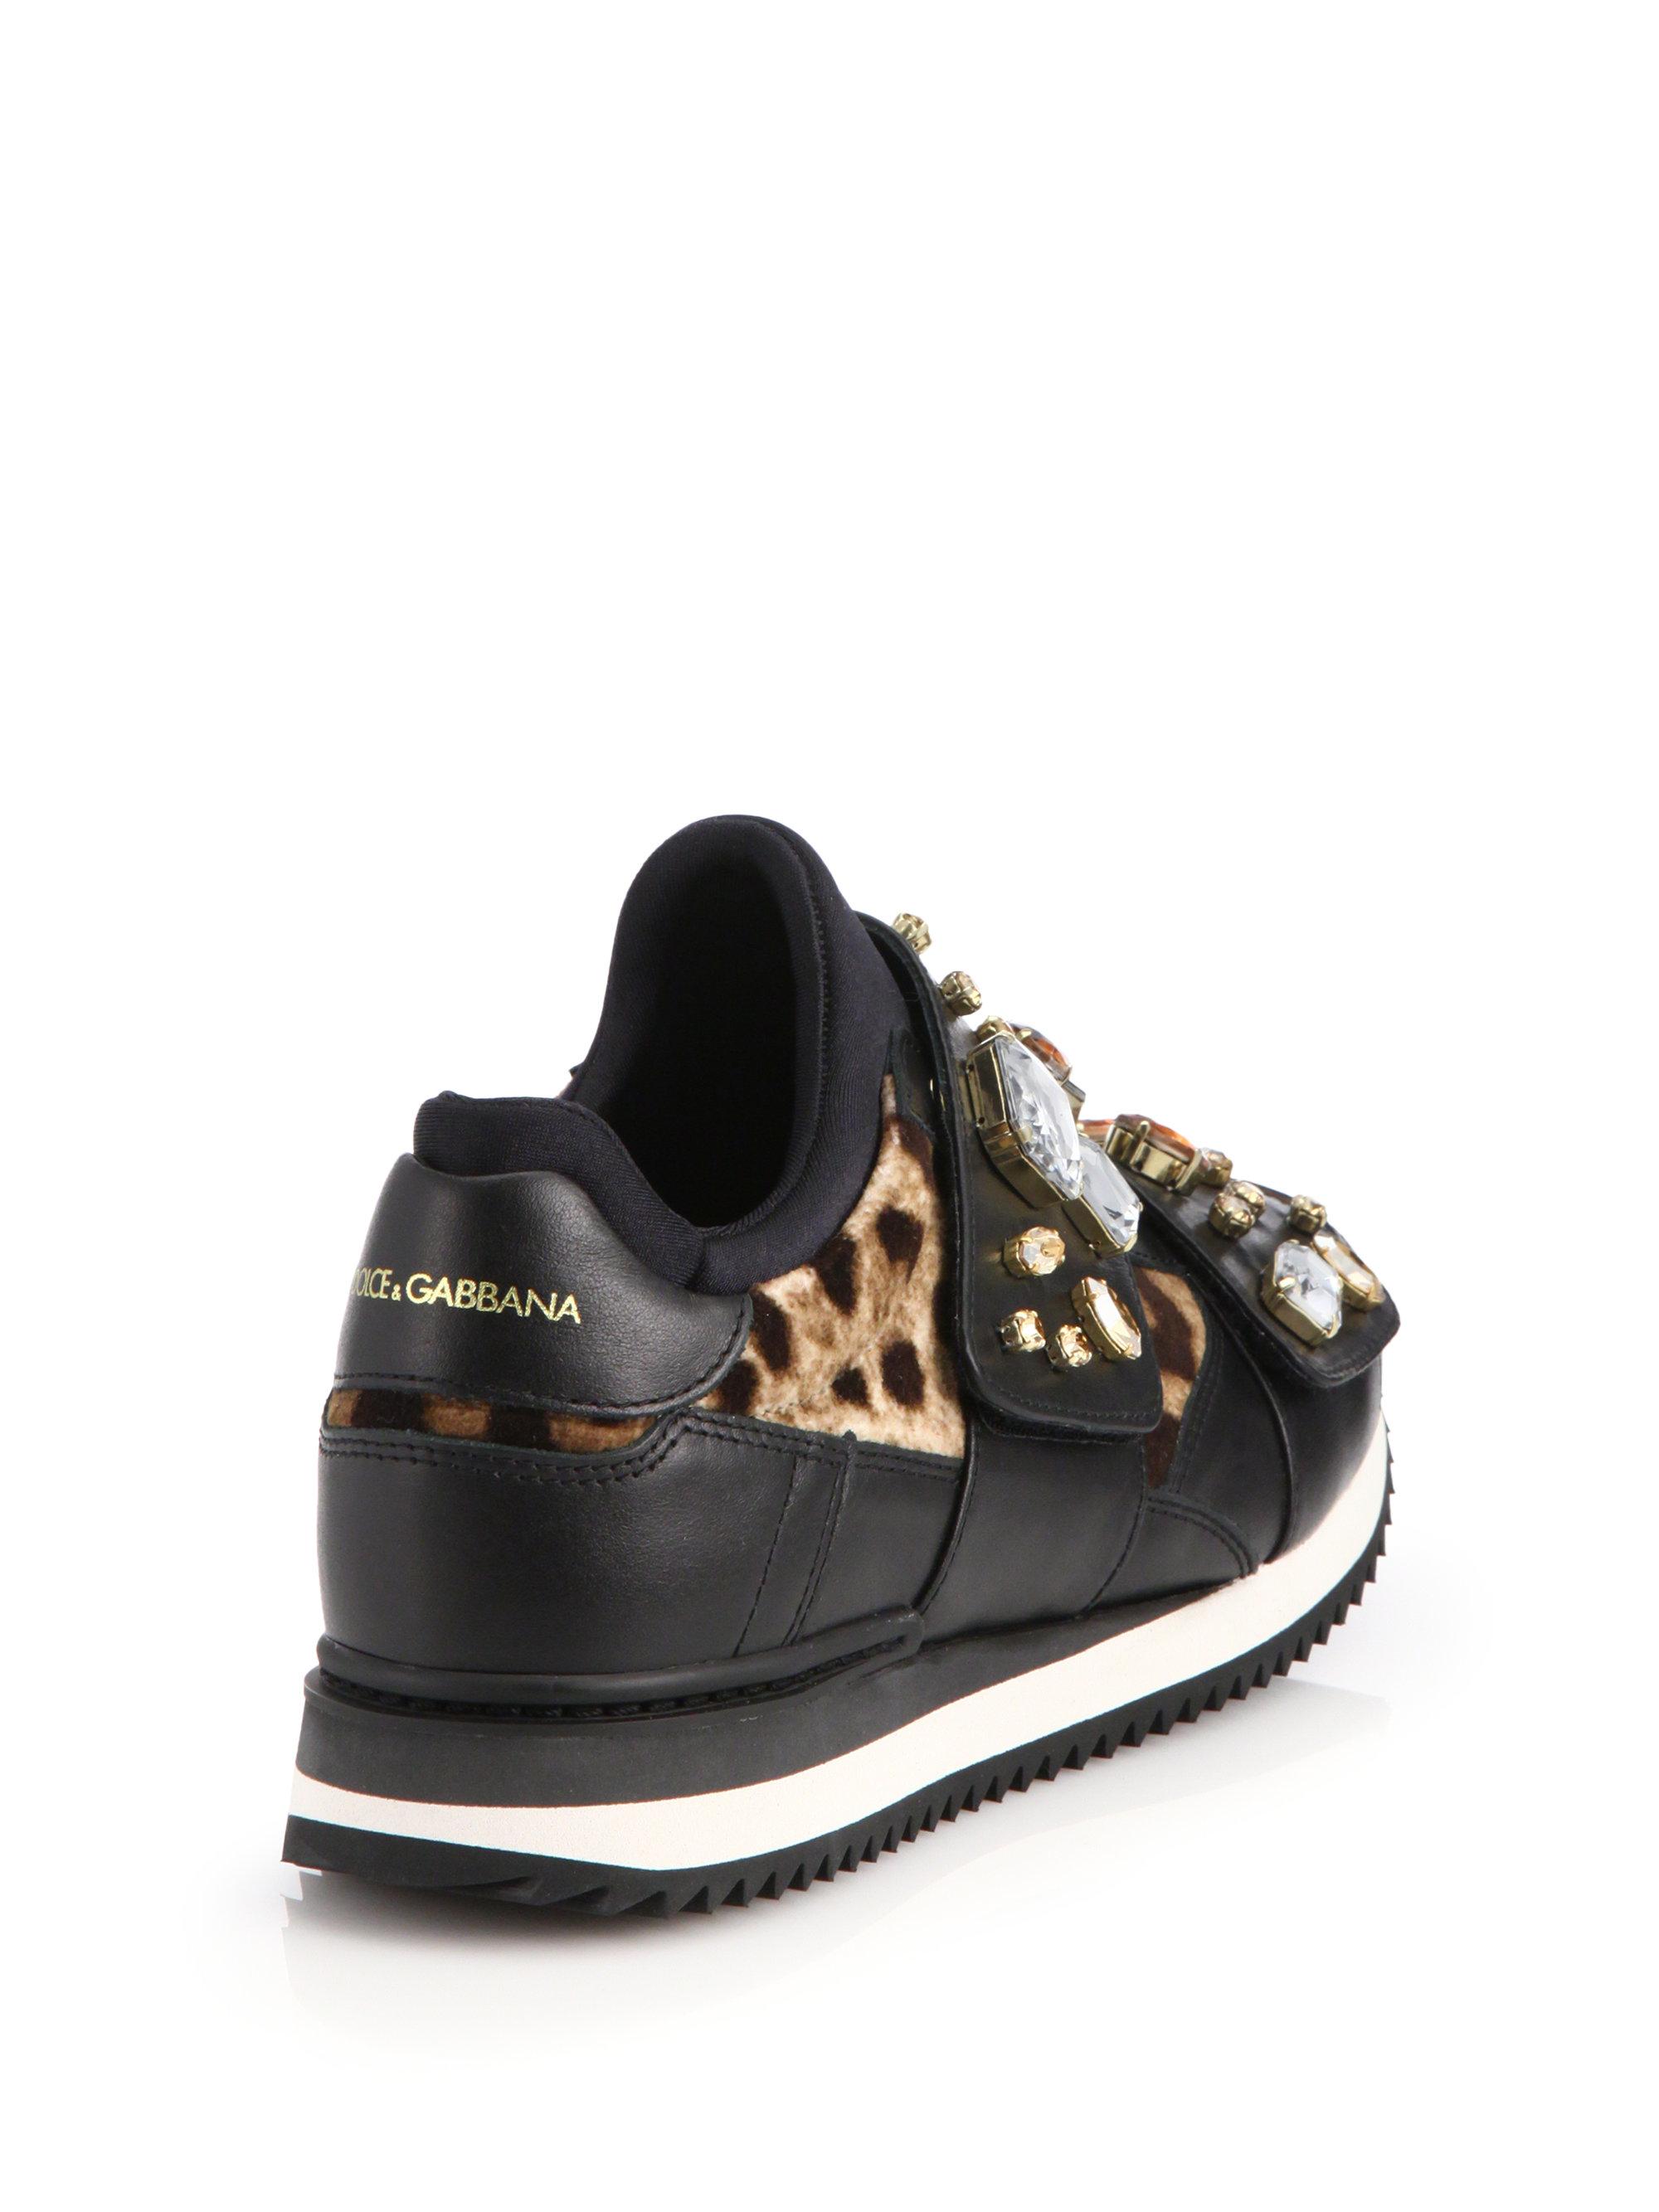 dolce gabbana jeweled leather leopard print velvet sneakers in black lyst. Black Bedroom Furniture Sets. Home Design Ideas